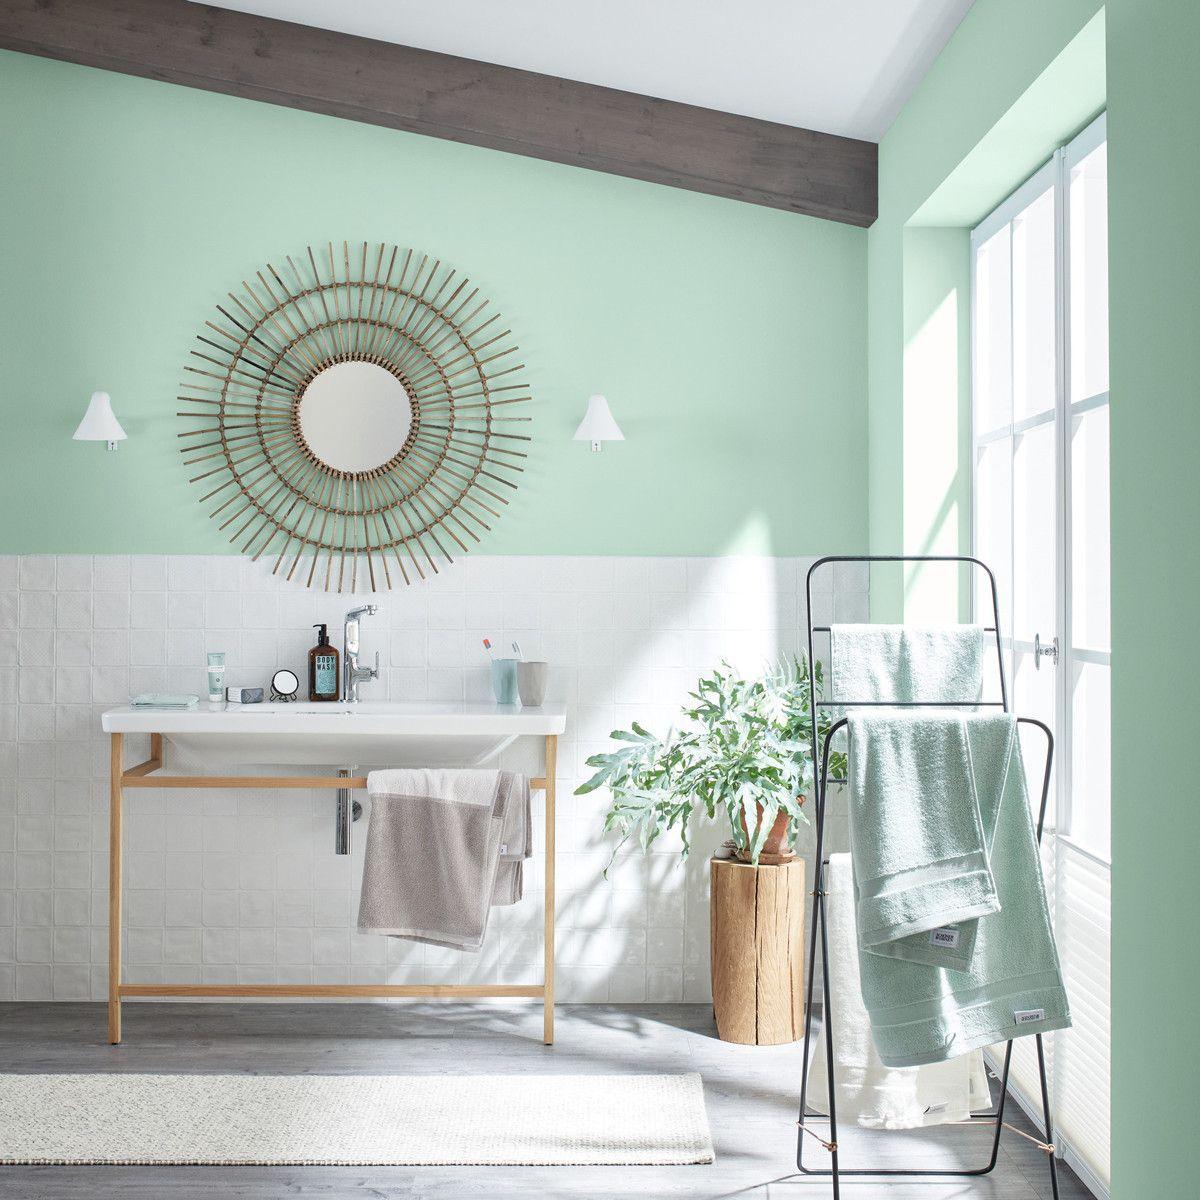 Wandfarbe Naturell Eukalyptusgrun Schoner Wohnen Kollektion In 2020 Schoner Wohnen Wandfarbe Schoner Wohnen Farbe Wandfarbe Grun